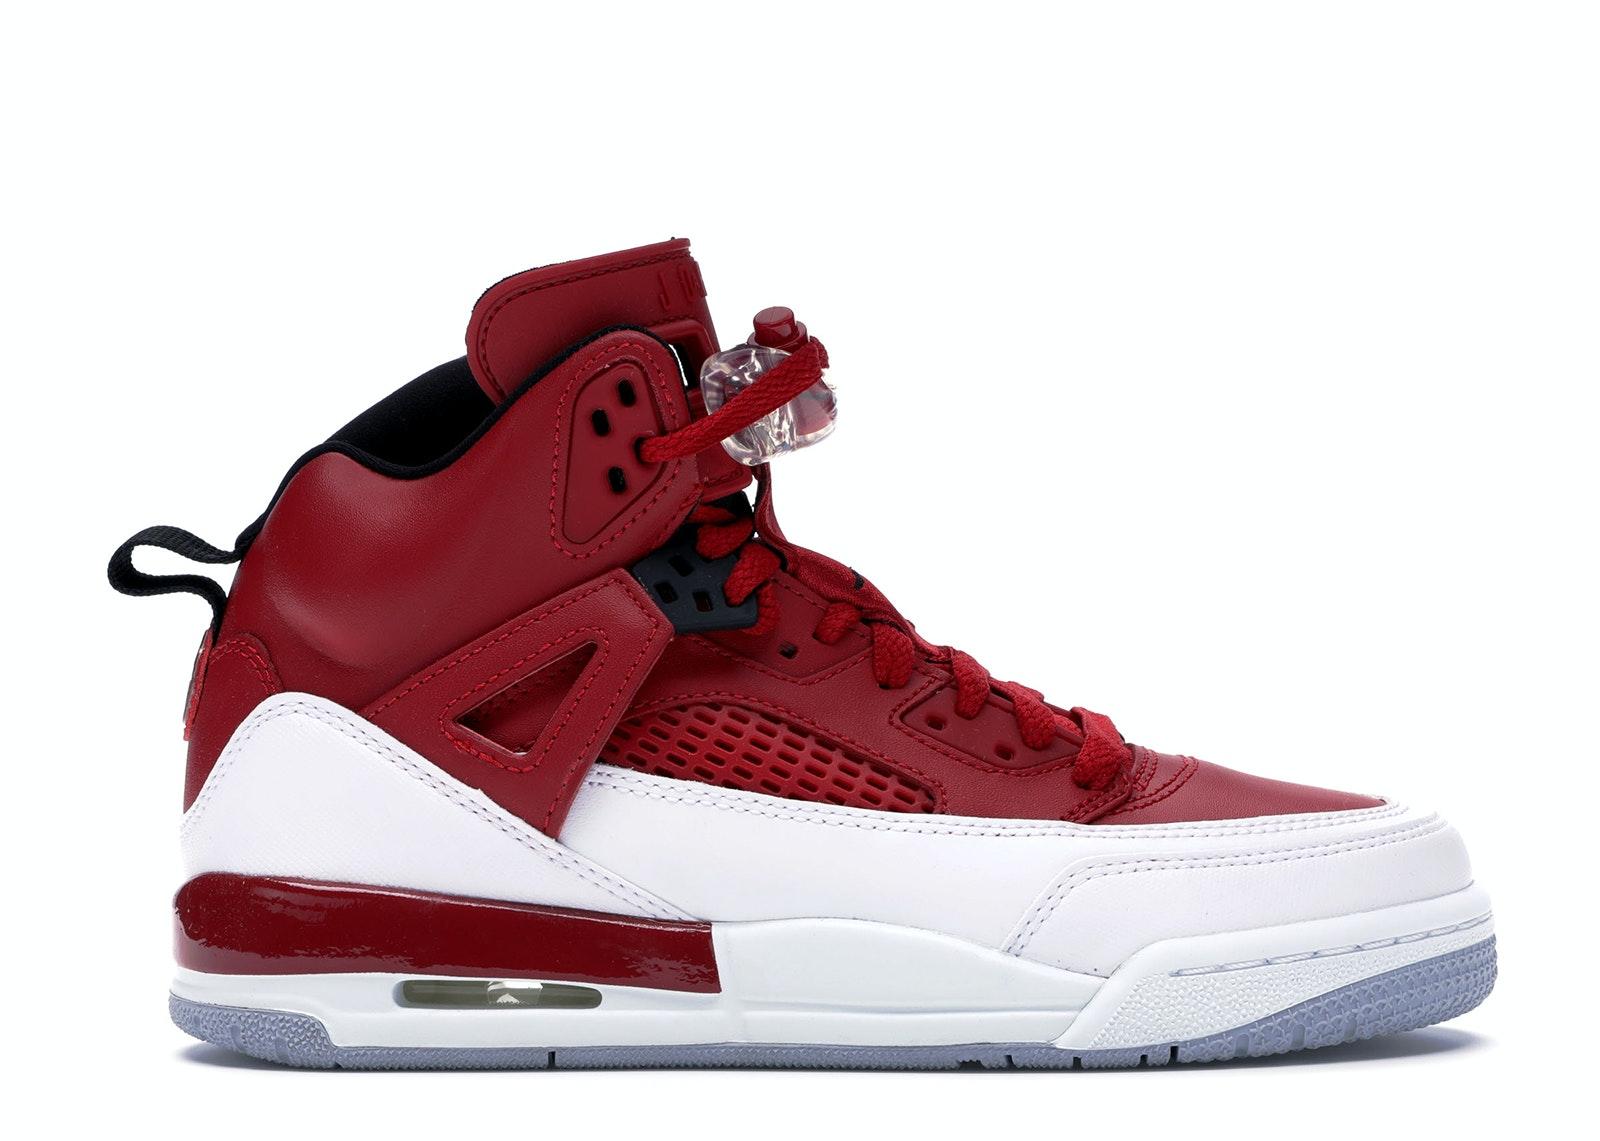 Jordan Spiz'ike Gym Red (GS)